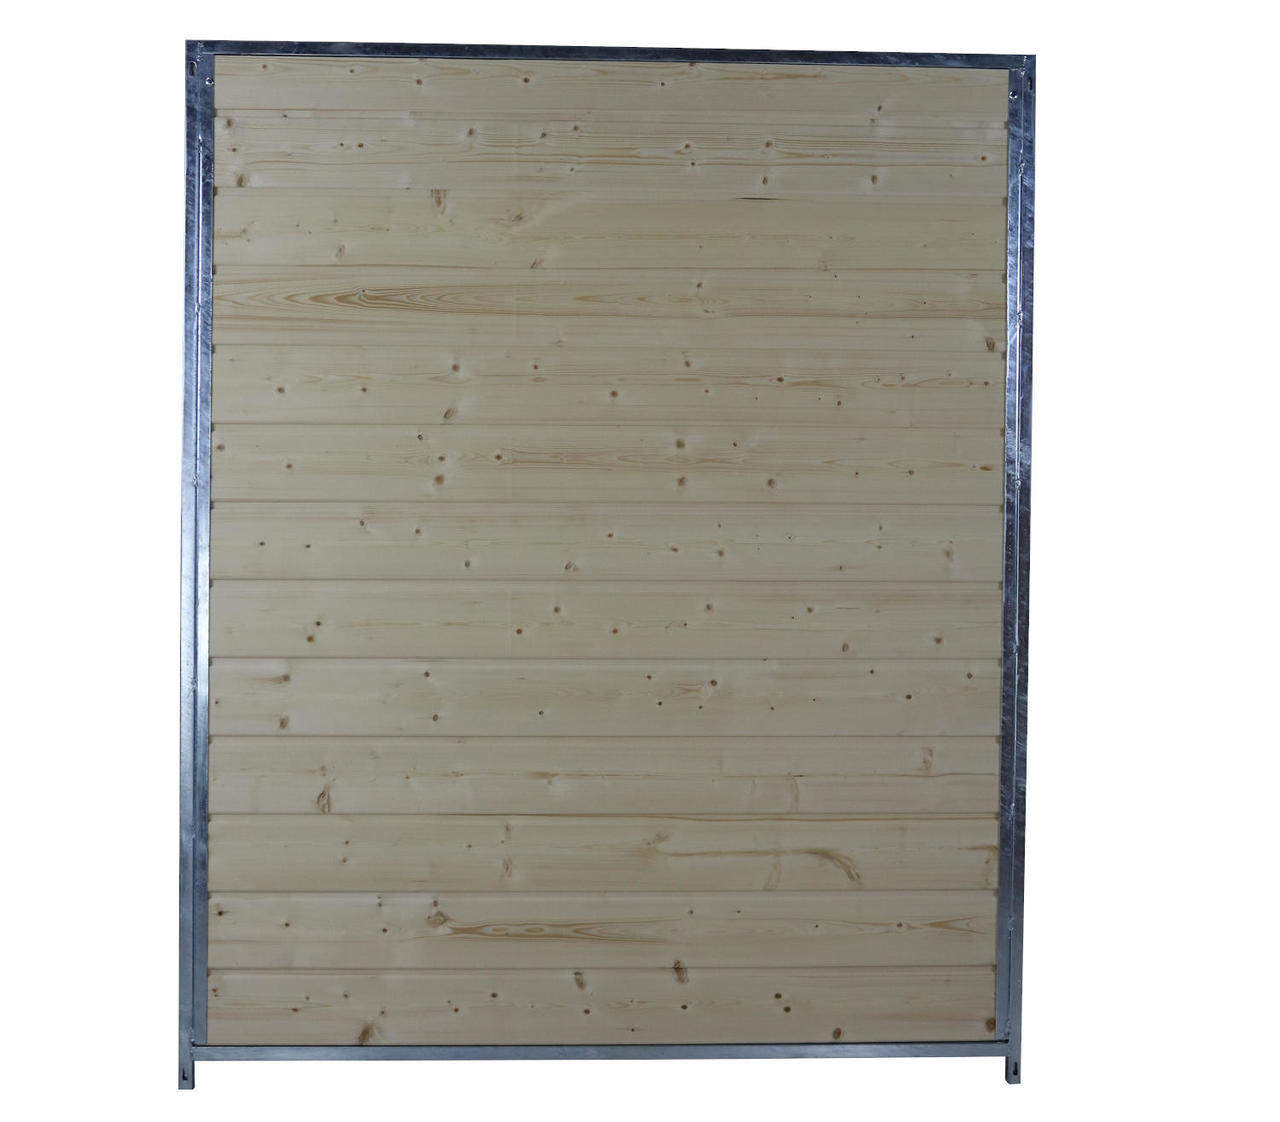 Sonderserie Holzelement B 150 cm mit Metallrahmen, naturbelassen